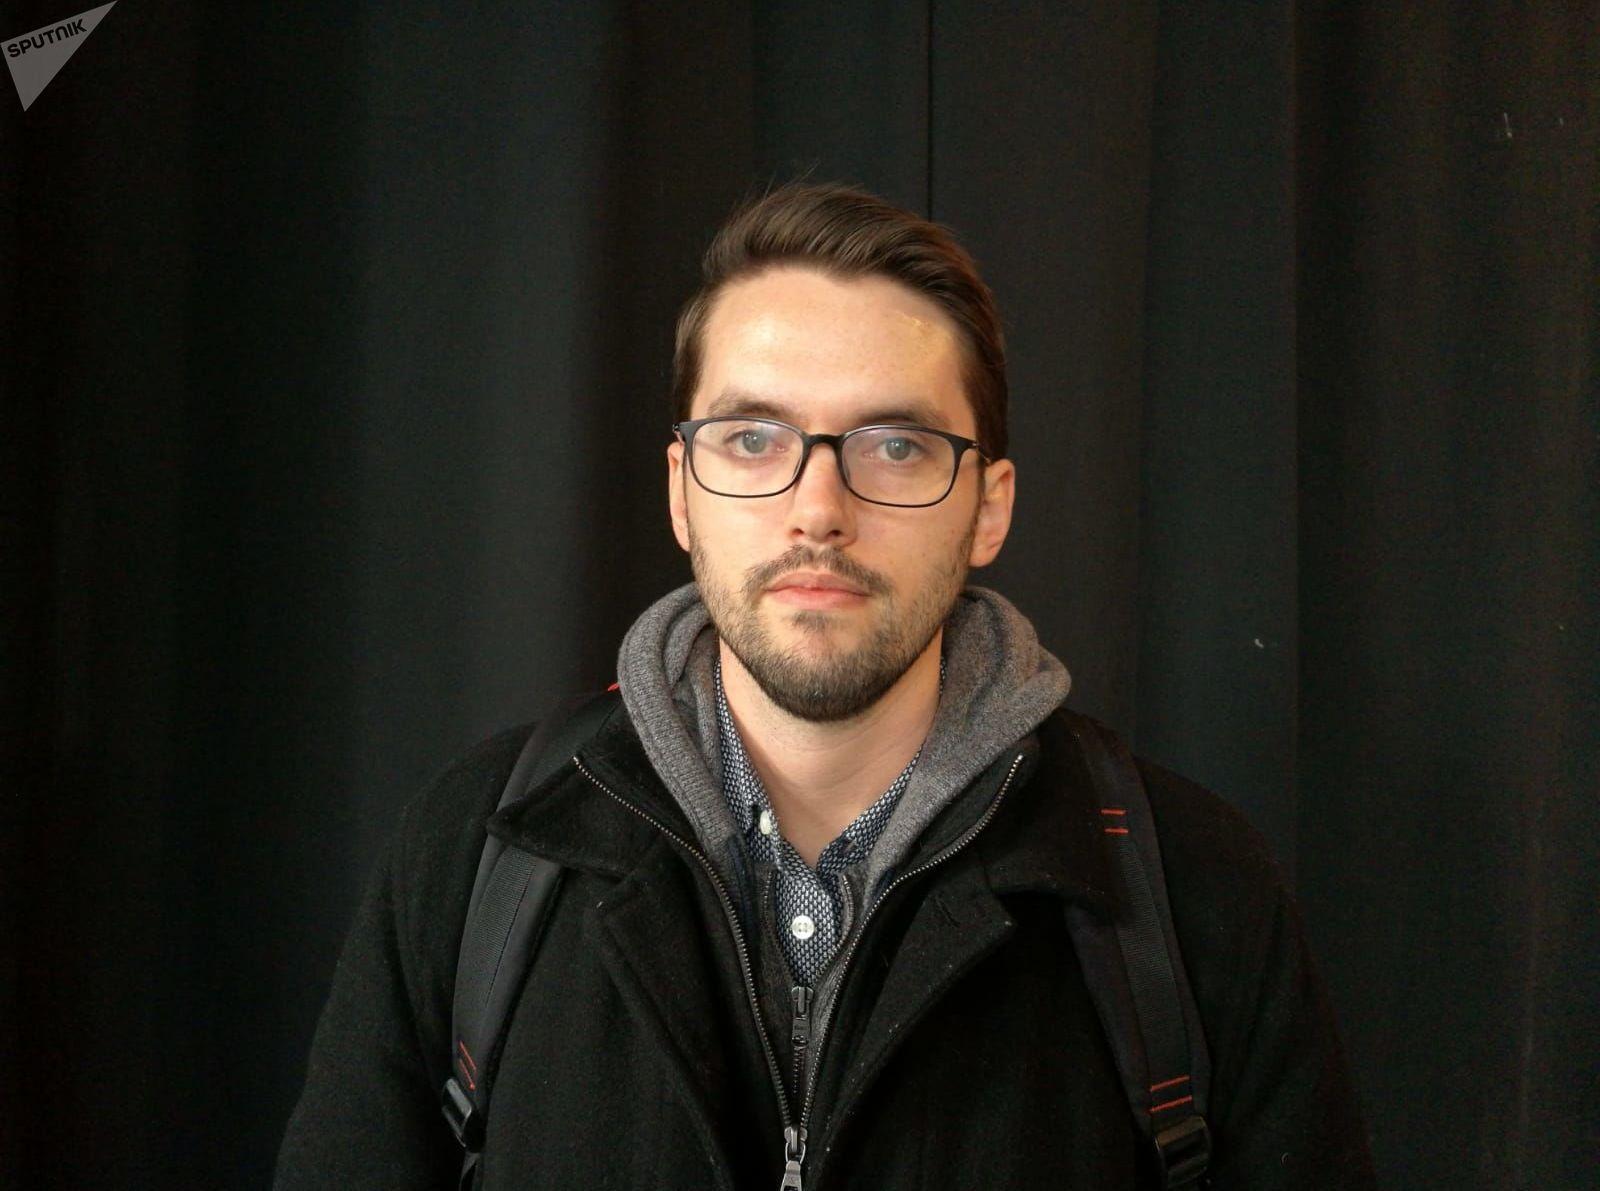 Andrew Fishman, editor de The Intercept Brasil, durante el 'Media Party 2019'